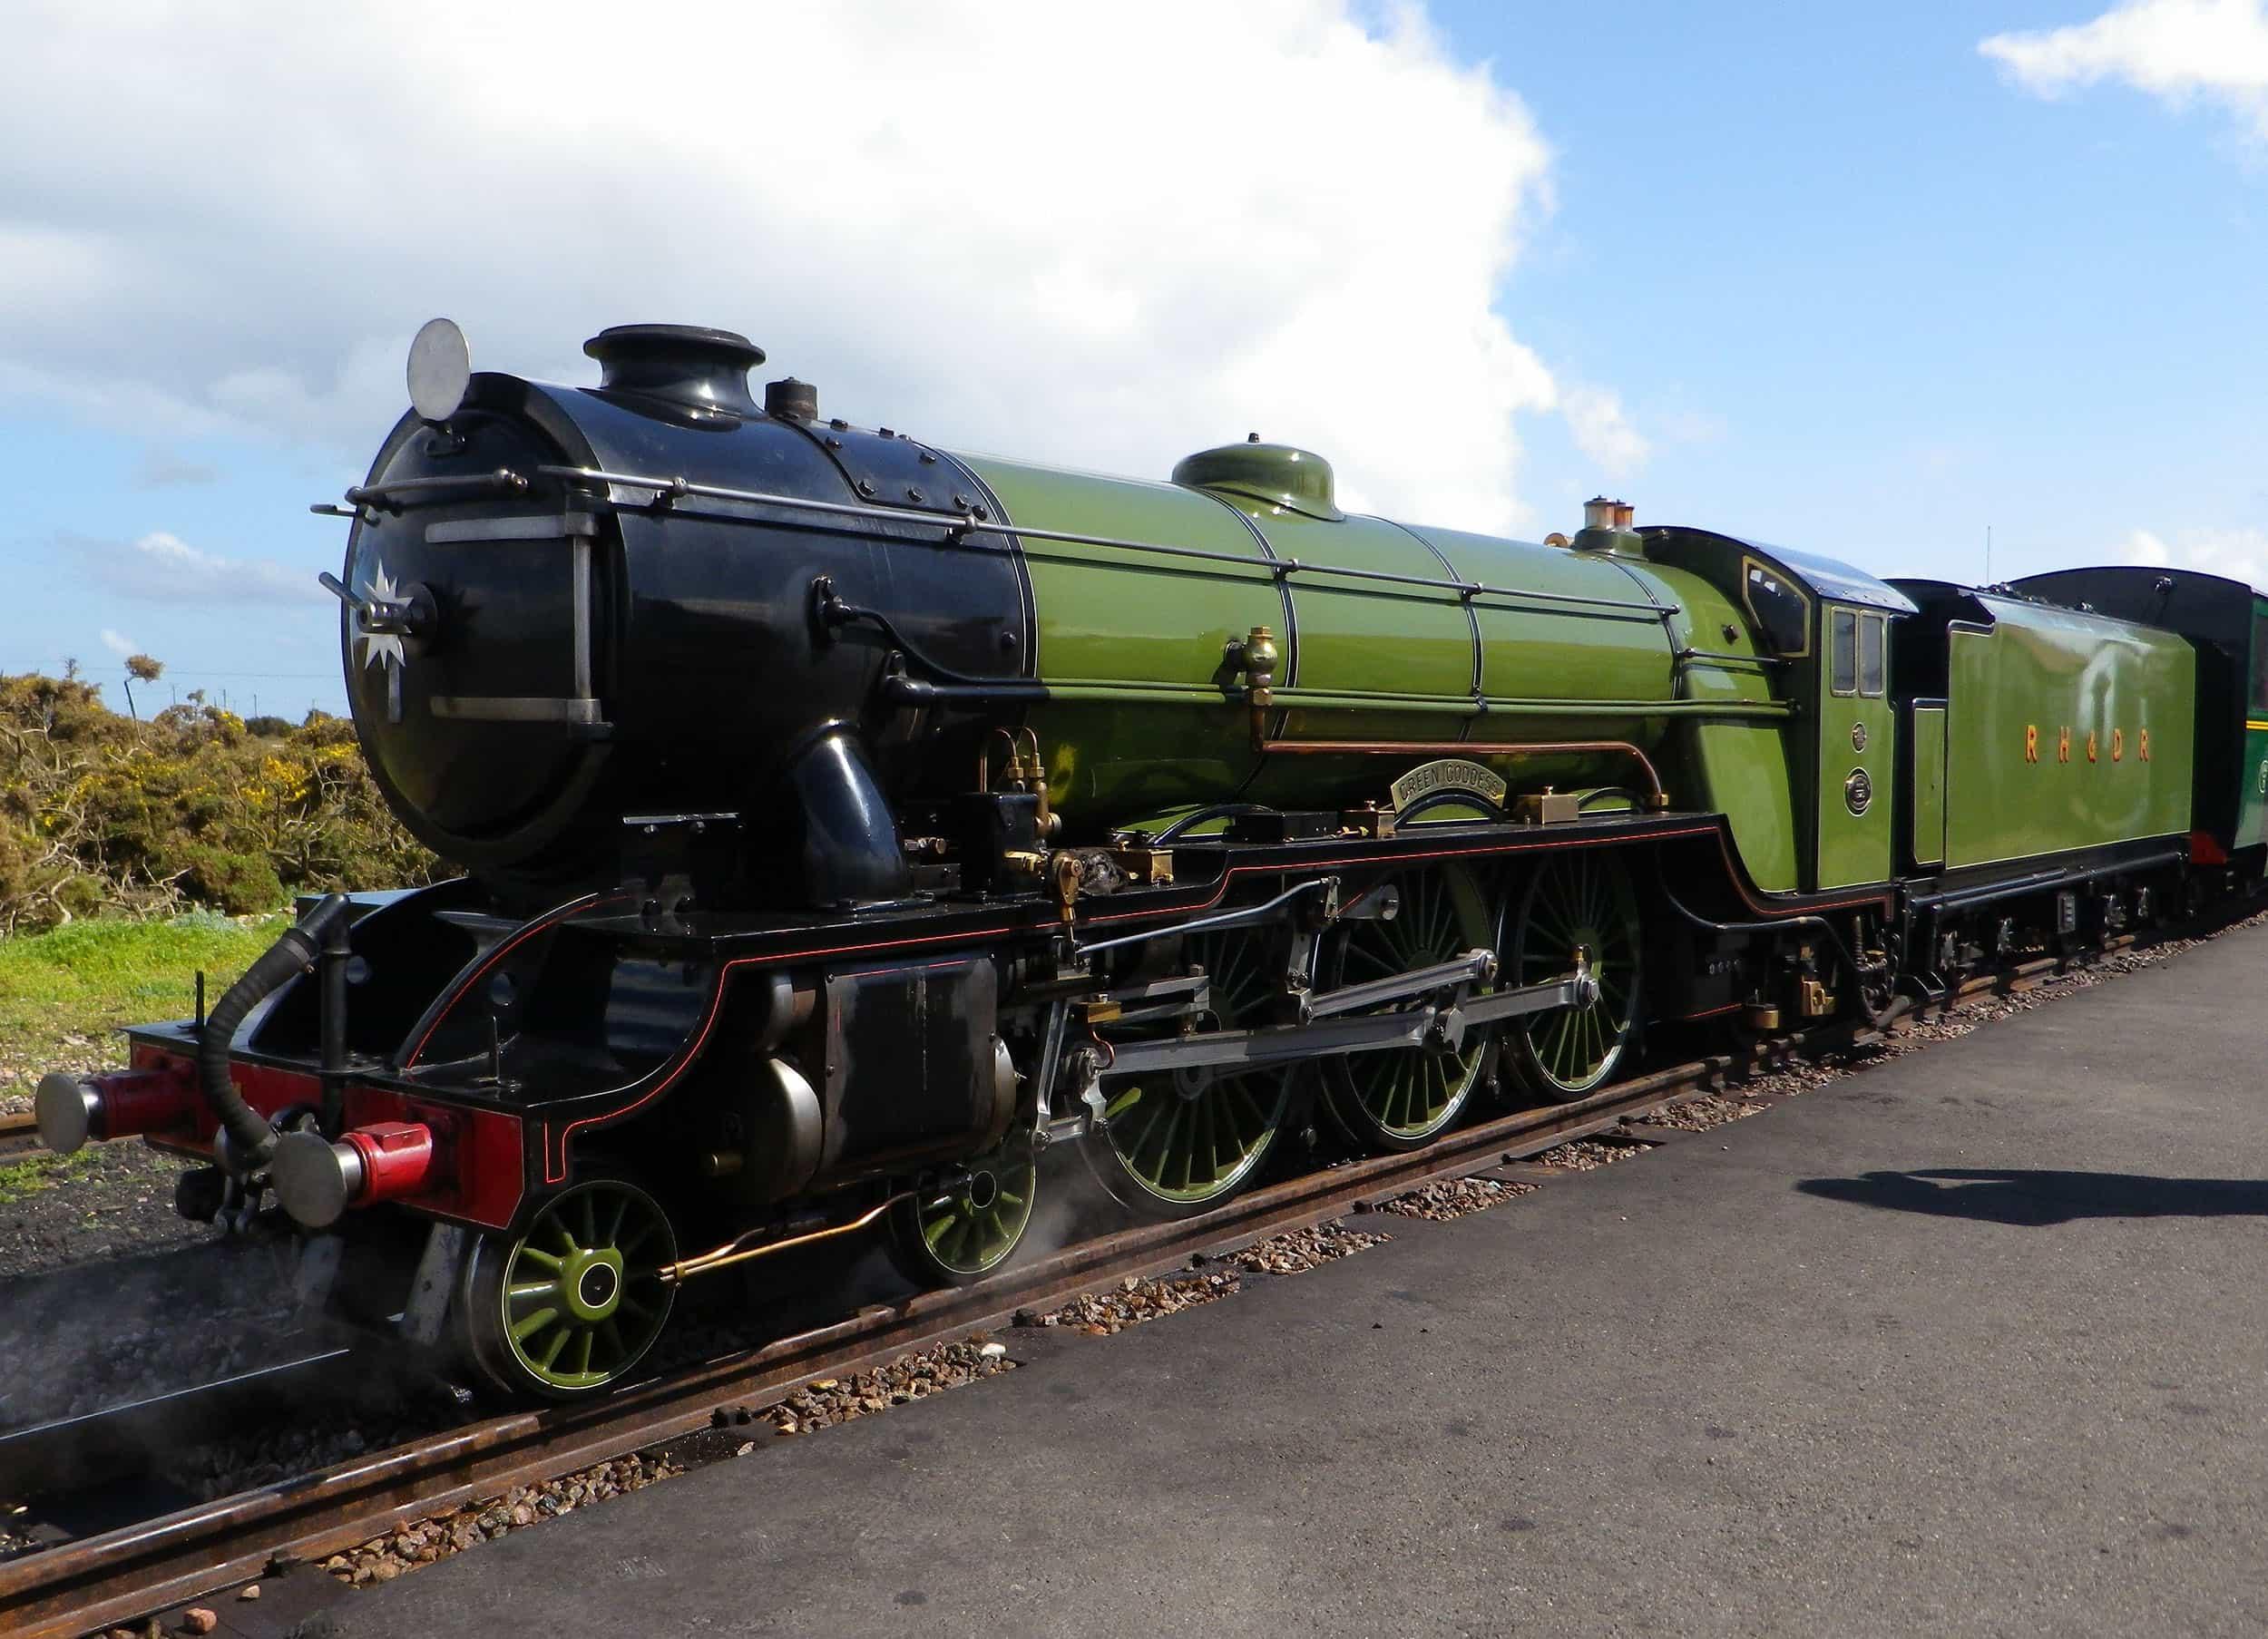 Green Goddess - Romney, Hythe & Dymchurch Railway